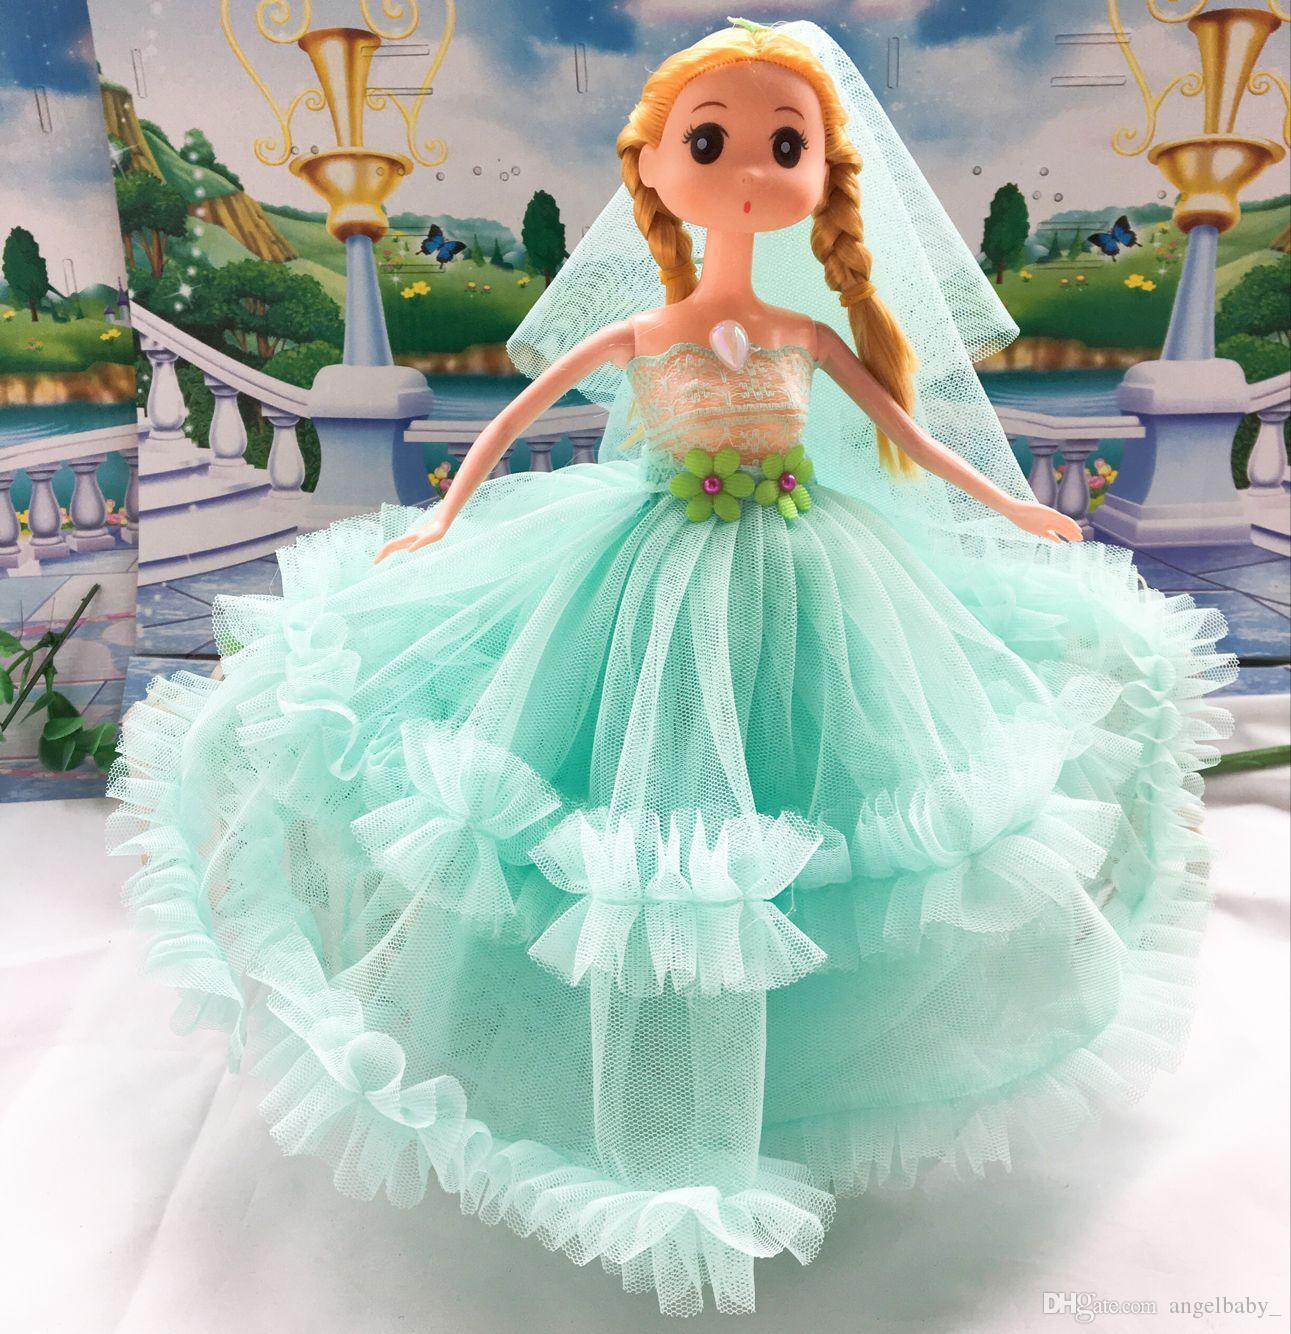 2017 New Girl Gifts Barbie Doll Wedding Dress Lace Birthday Present ...